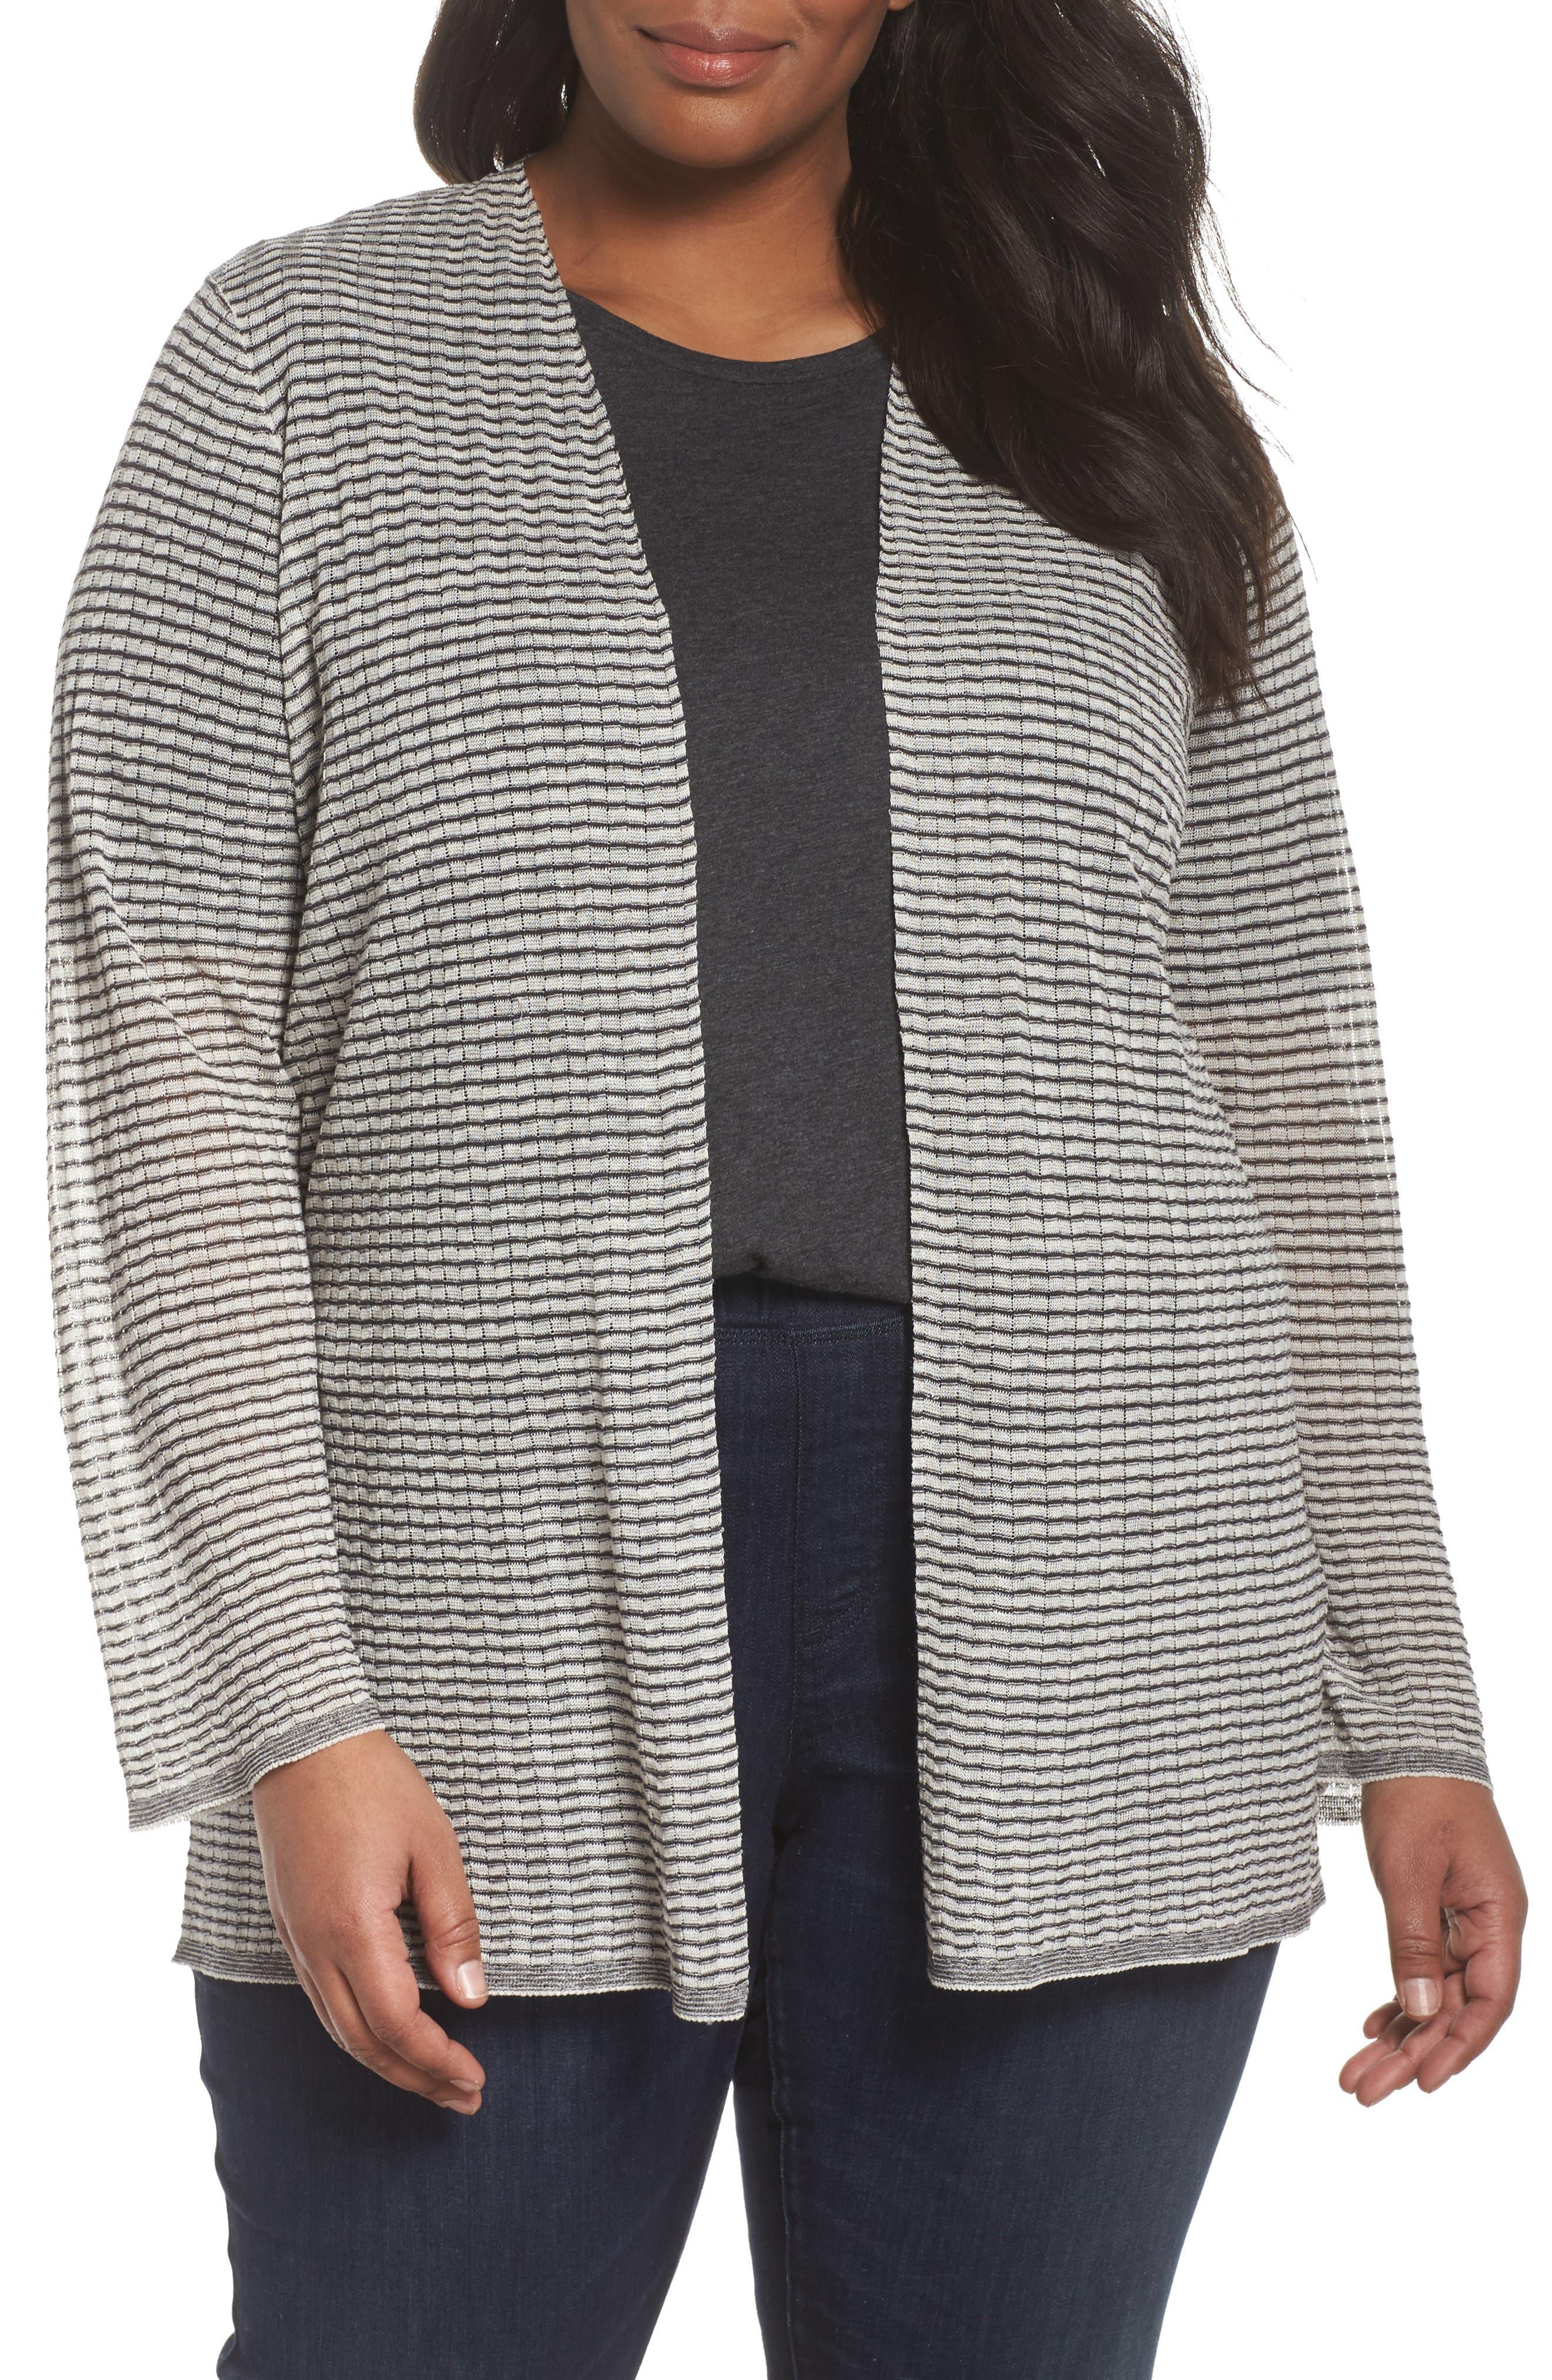 Eileen Fisher Simple Stripe Linen Blend Cardigan (Plus Size)